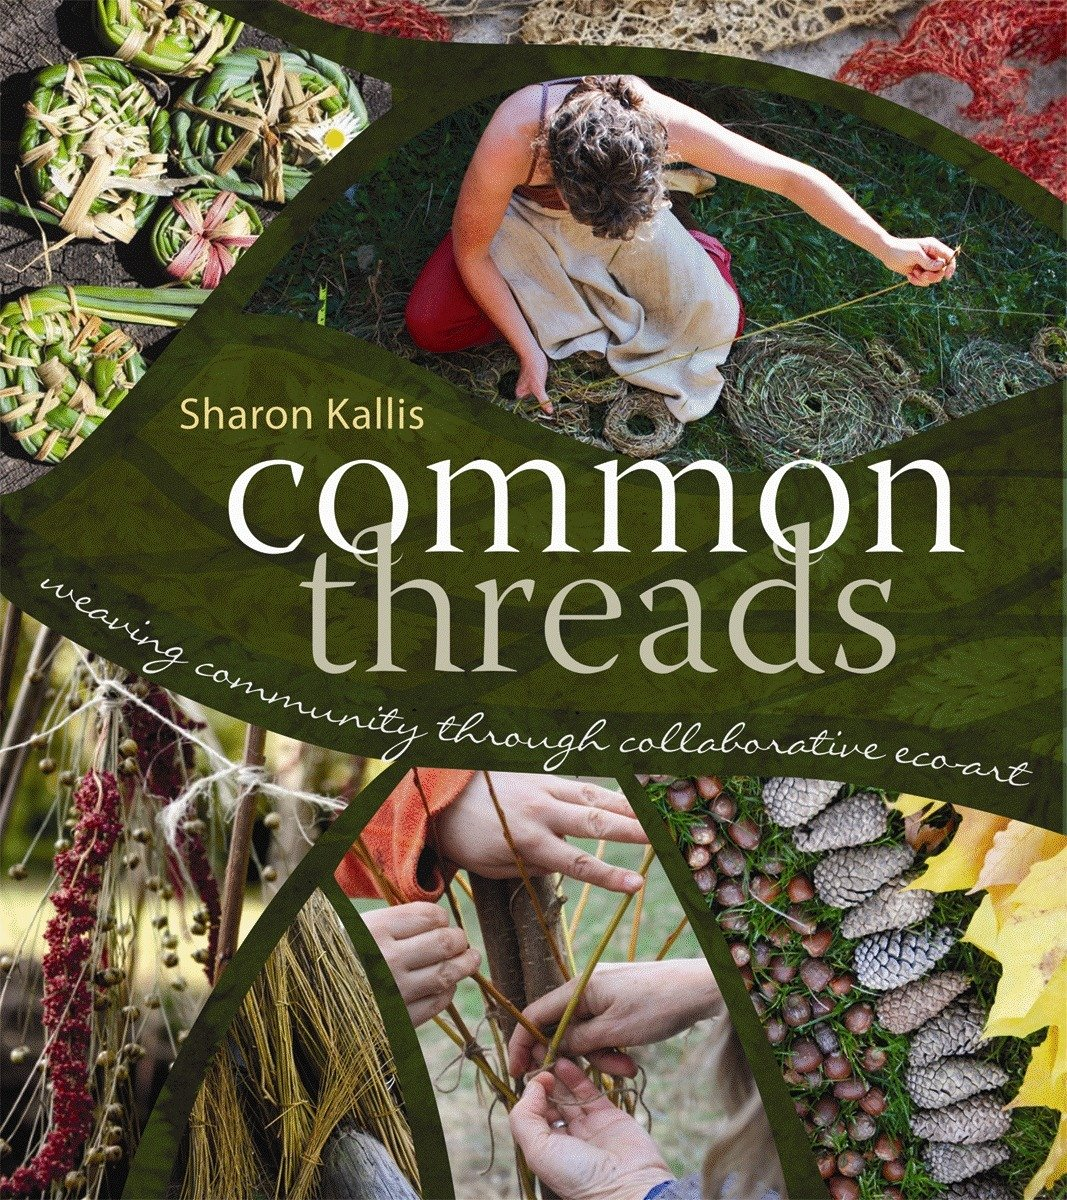 Common Threads: Weaving Community through Collaborative Eco-Art